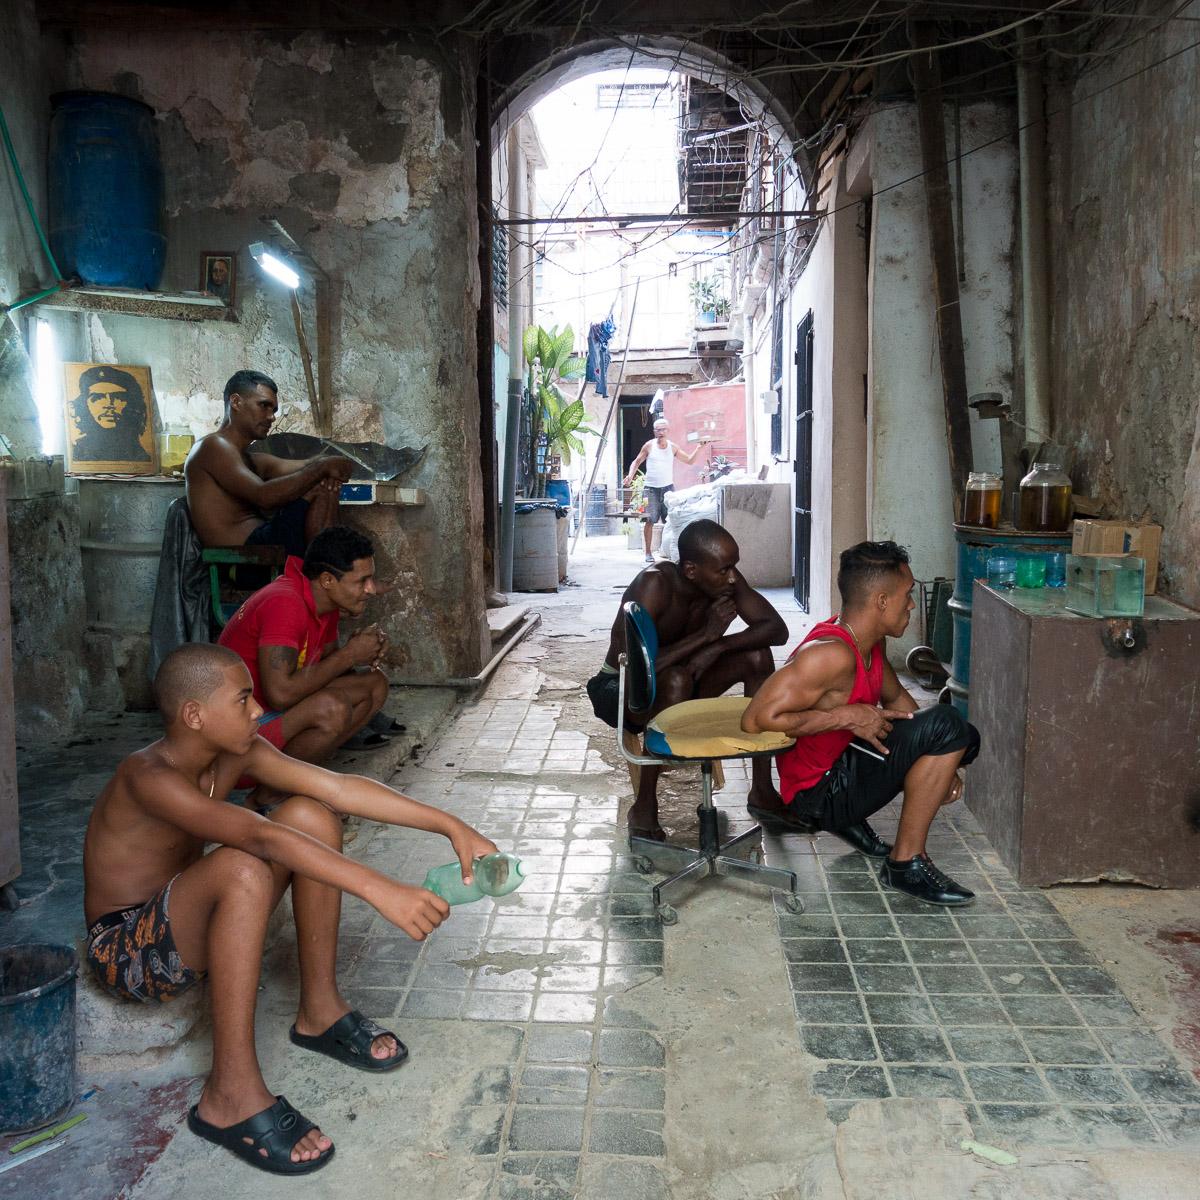 Reisfotografie_Cuba-005.jpg